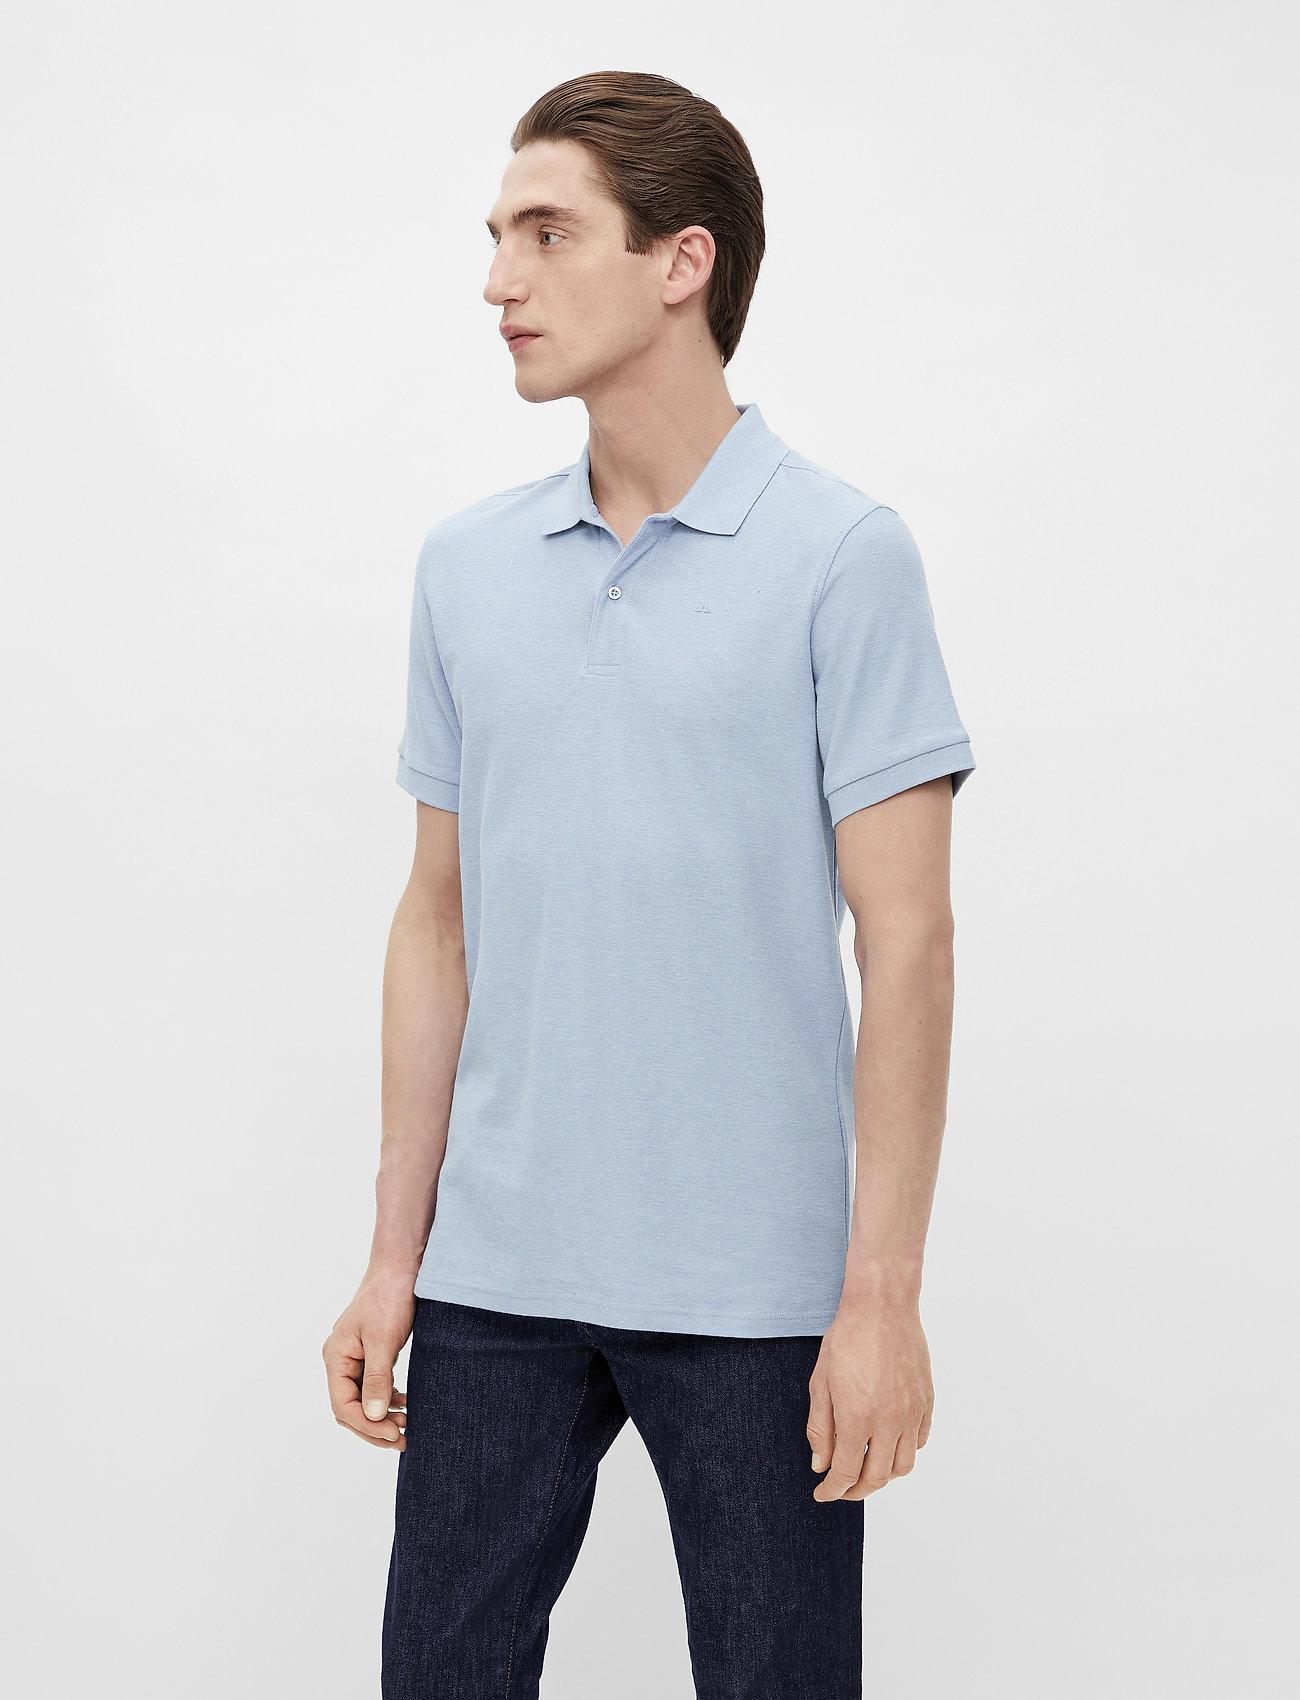 J. Lindeberg - Troy Polo Shirt Seasonal Pique - kurzärmelig - spring blue melange - 0